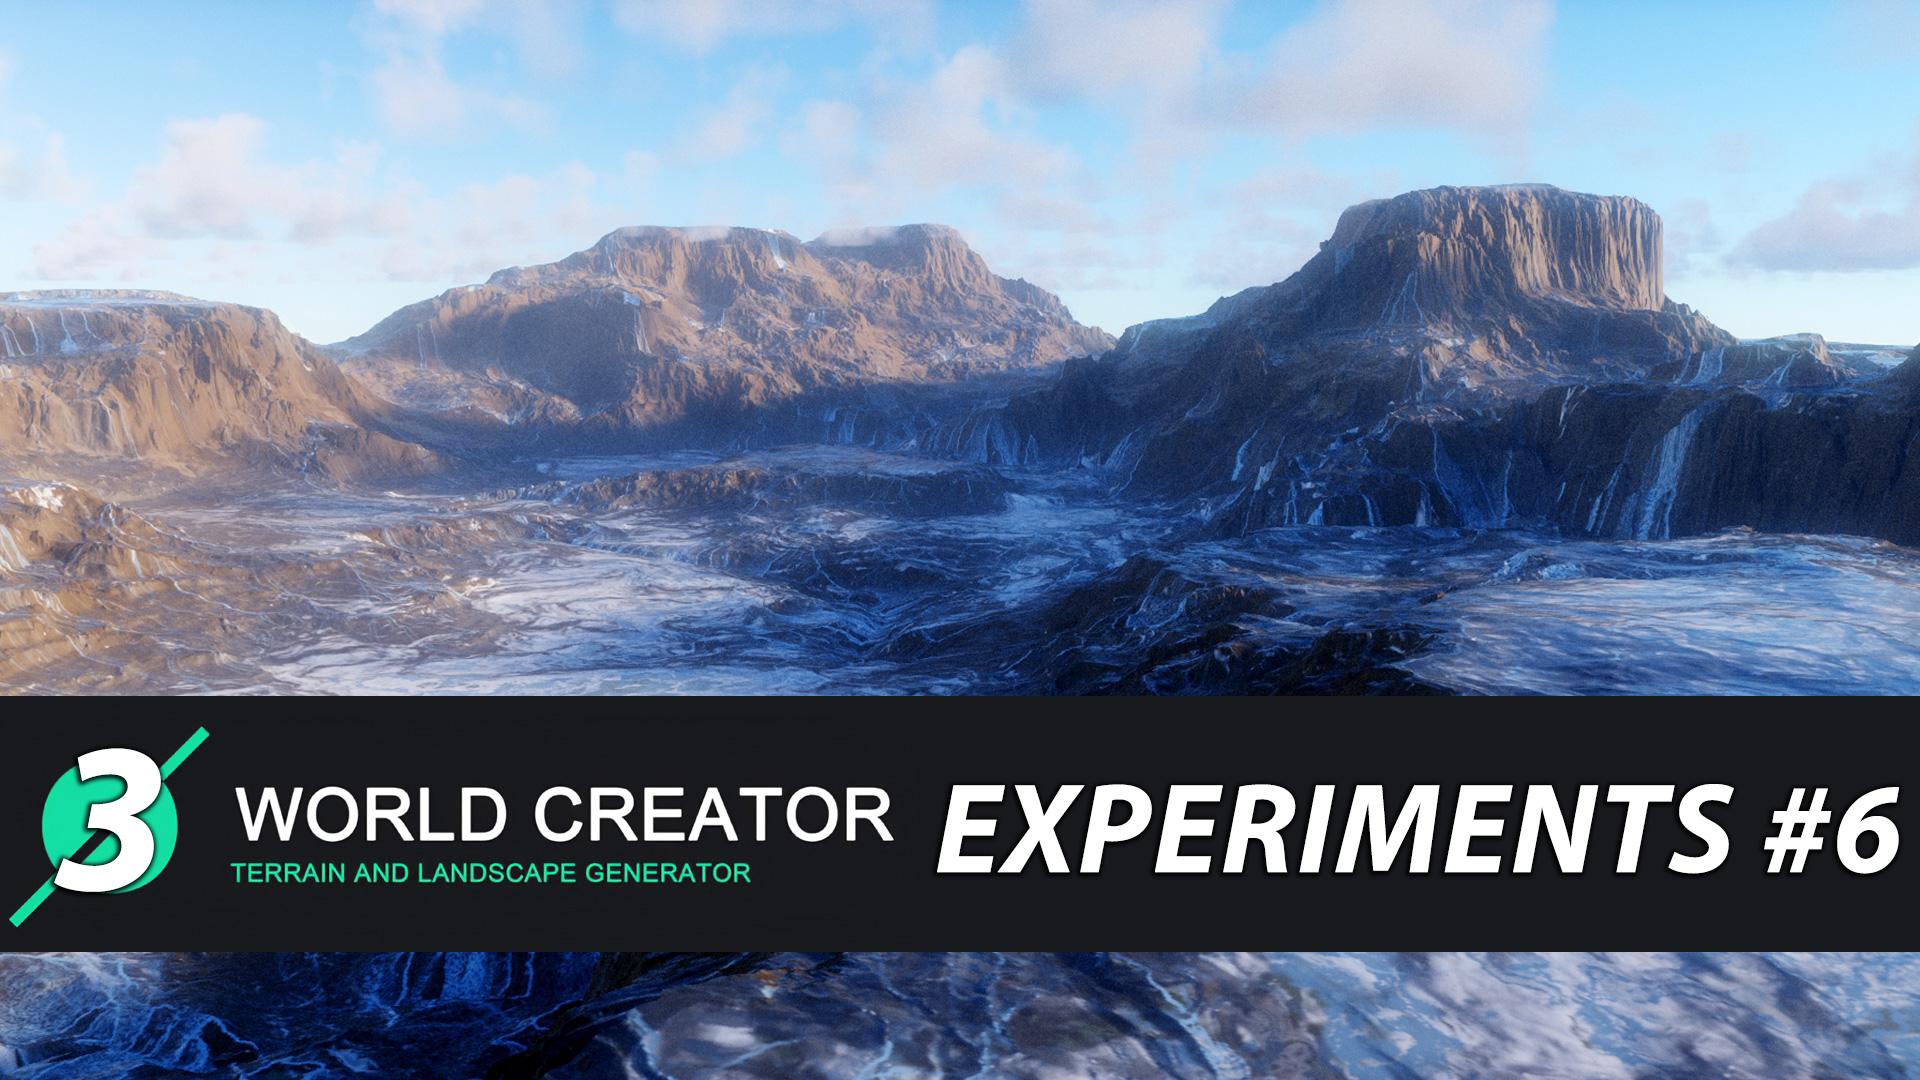 WC3_EXPERIMENTS_youtube.jpg